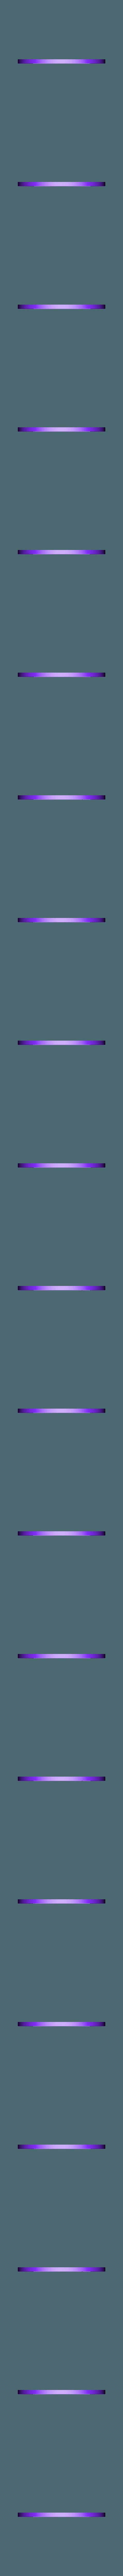 Uta_jazz_blue.STL Download free STL file Minimal Multi-color NBA coasters • 3D print object, MosaicManufacturing